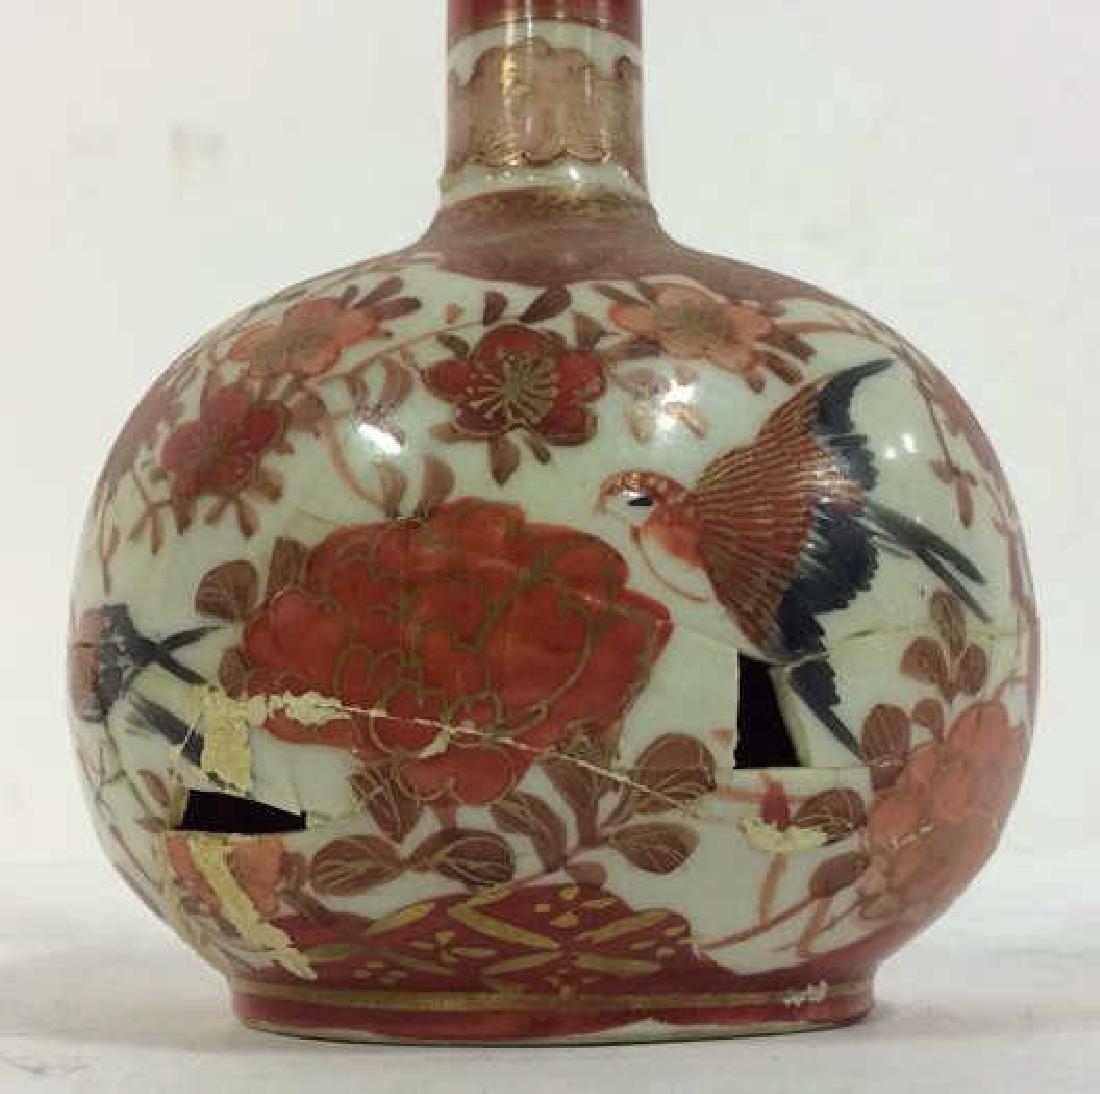 Ceramic Porcelain Asian Style Vase - 4